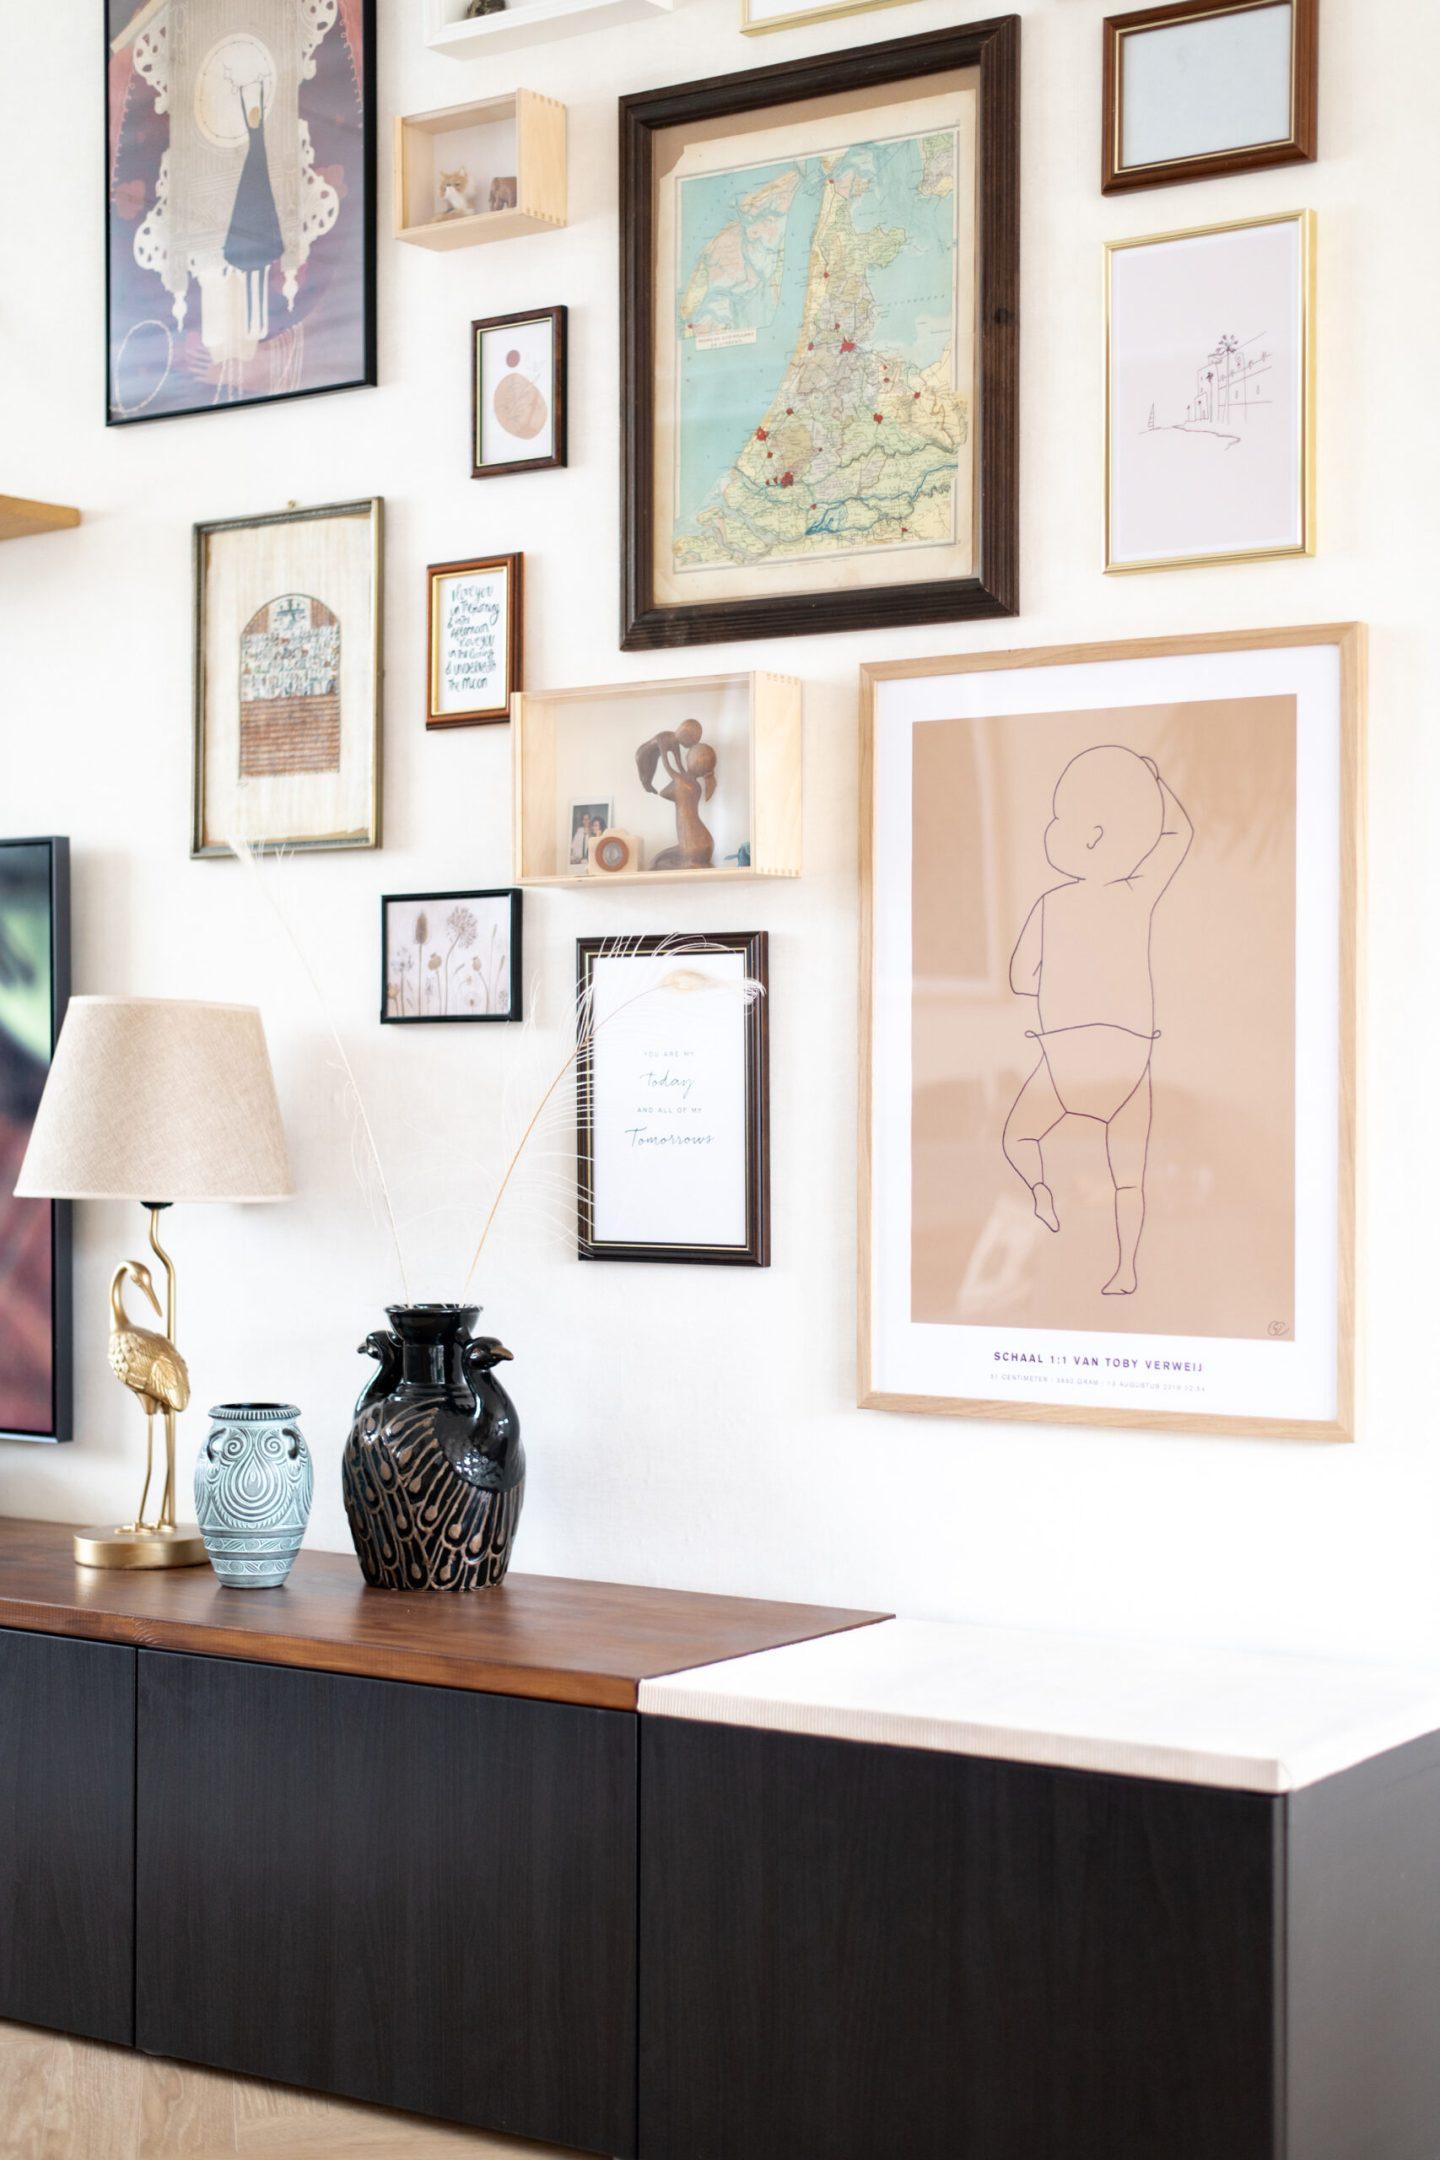 tv-wand interieurstyling interieurinspiratie wanddecoratie wandstyling woonkamer tvmeubel vintage style frisse tinten